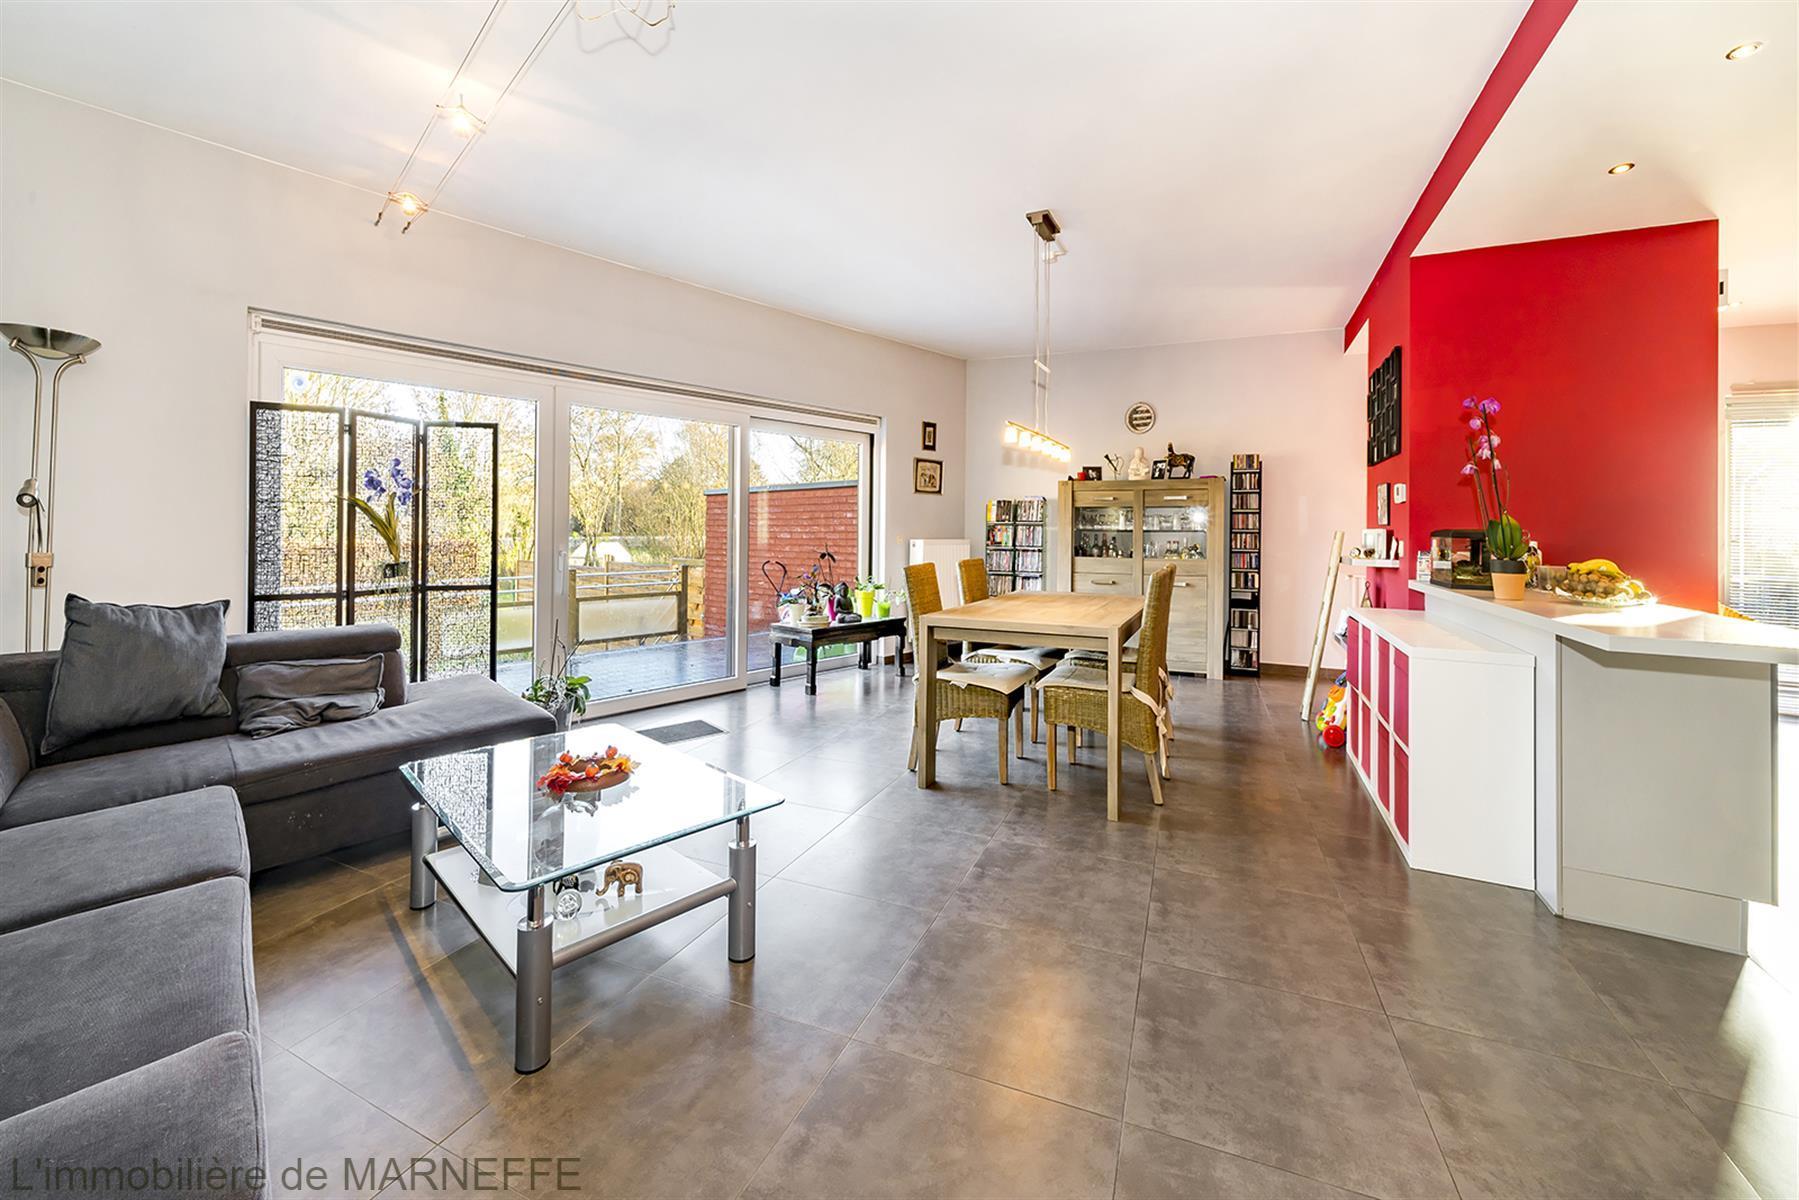 Appartement avec jardin - Orp-Jauche - #3625402-0